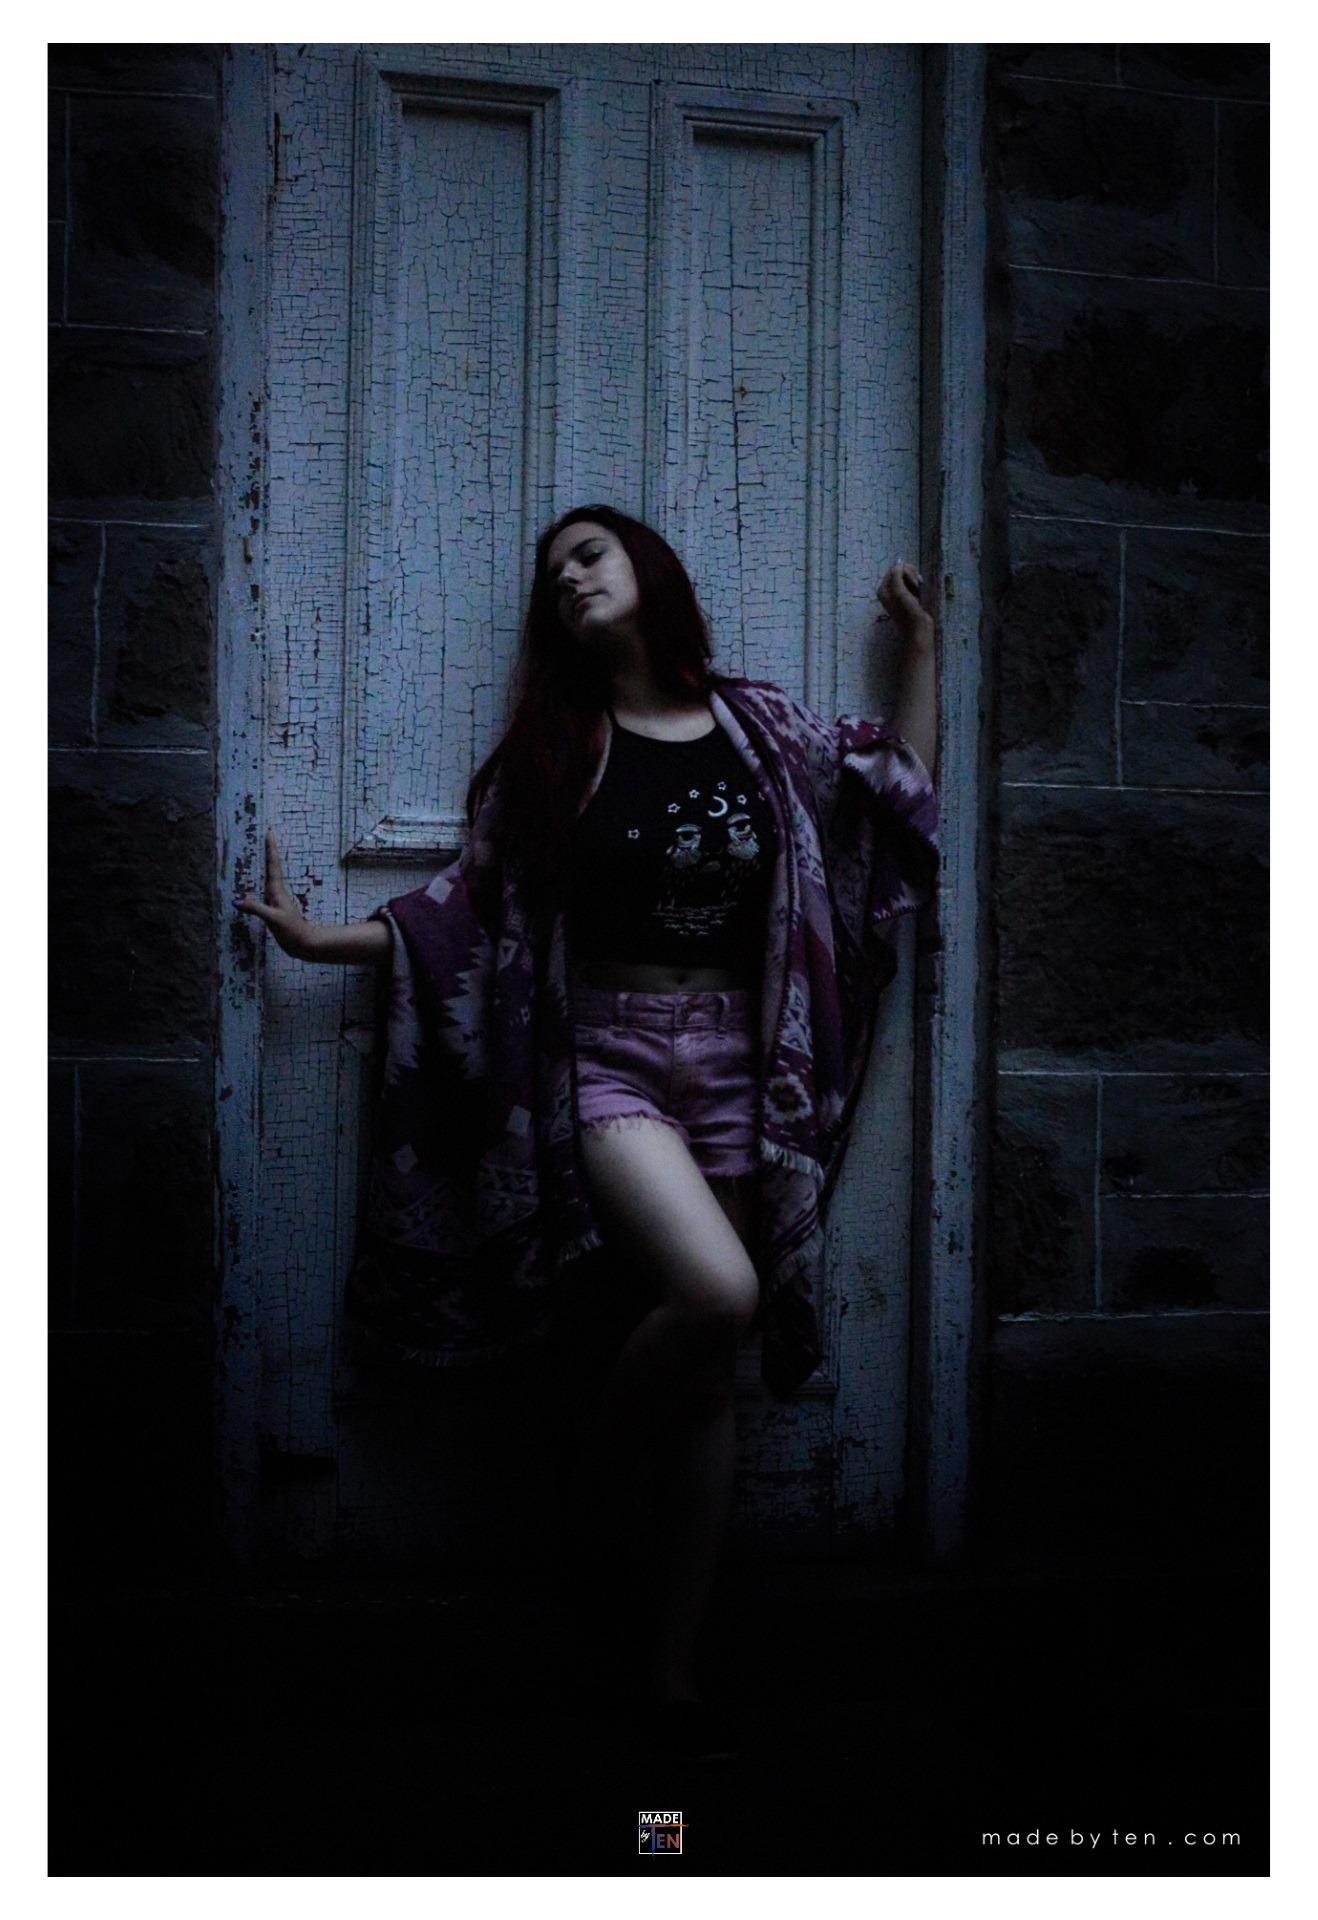 Creative Fantasy Photography Made By Ten